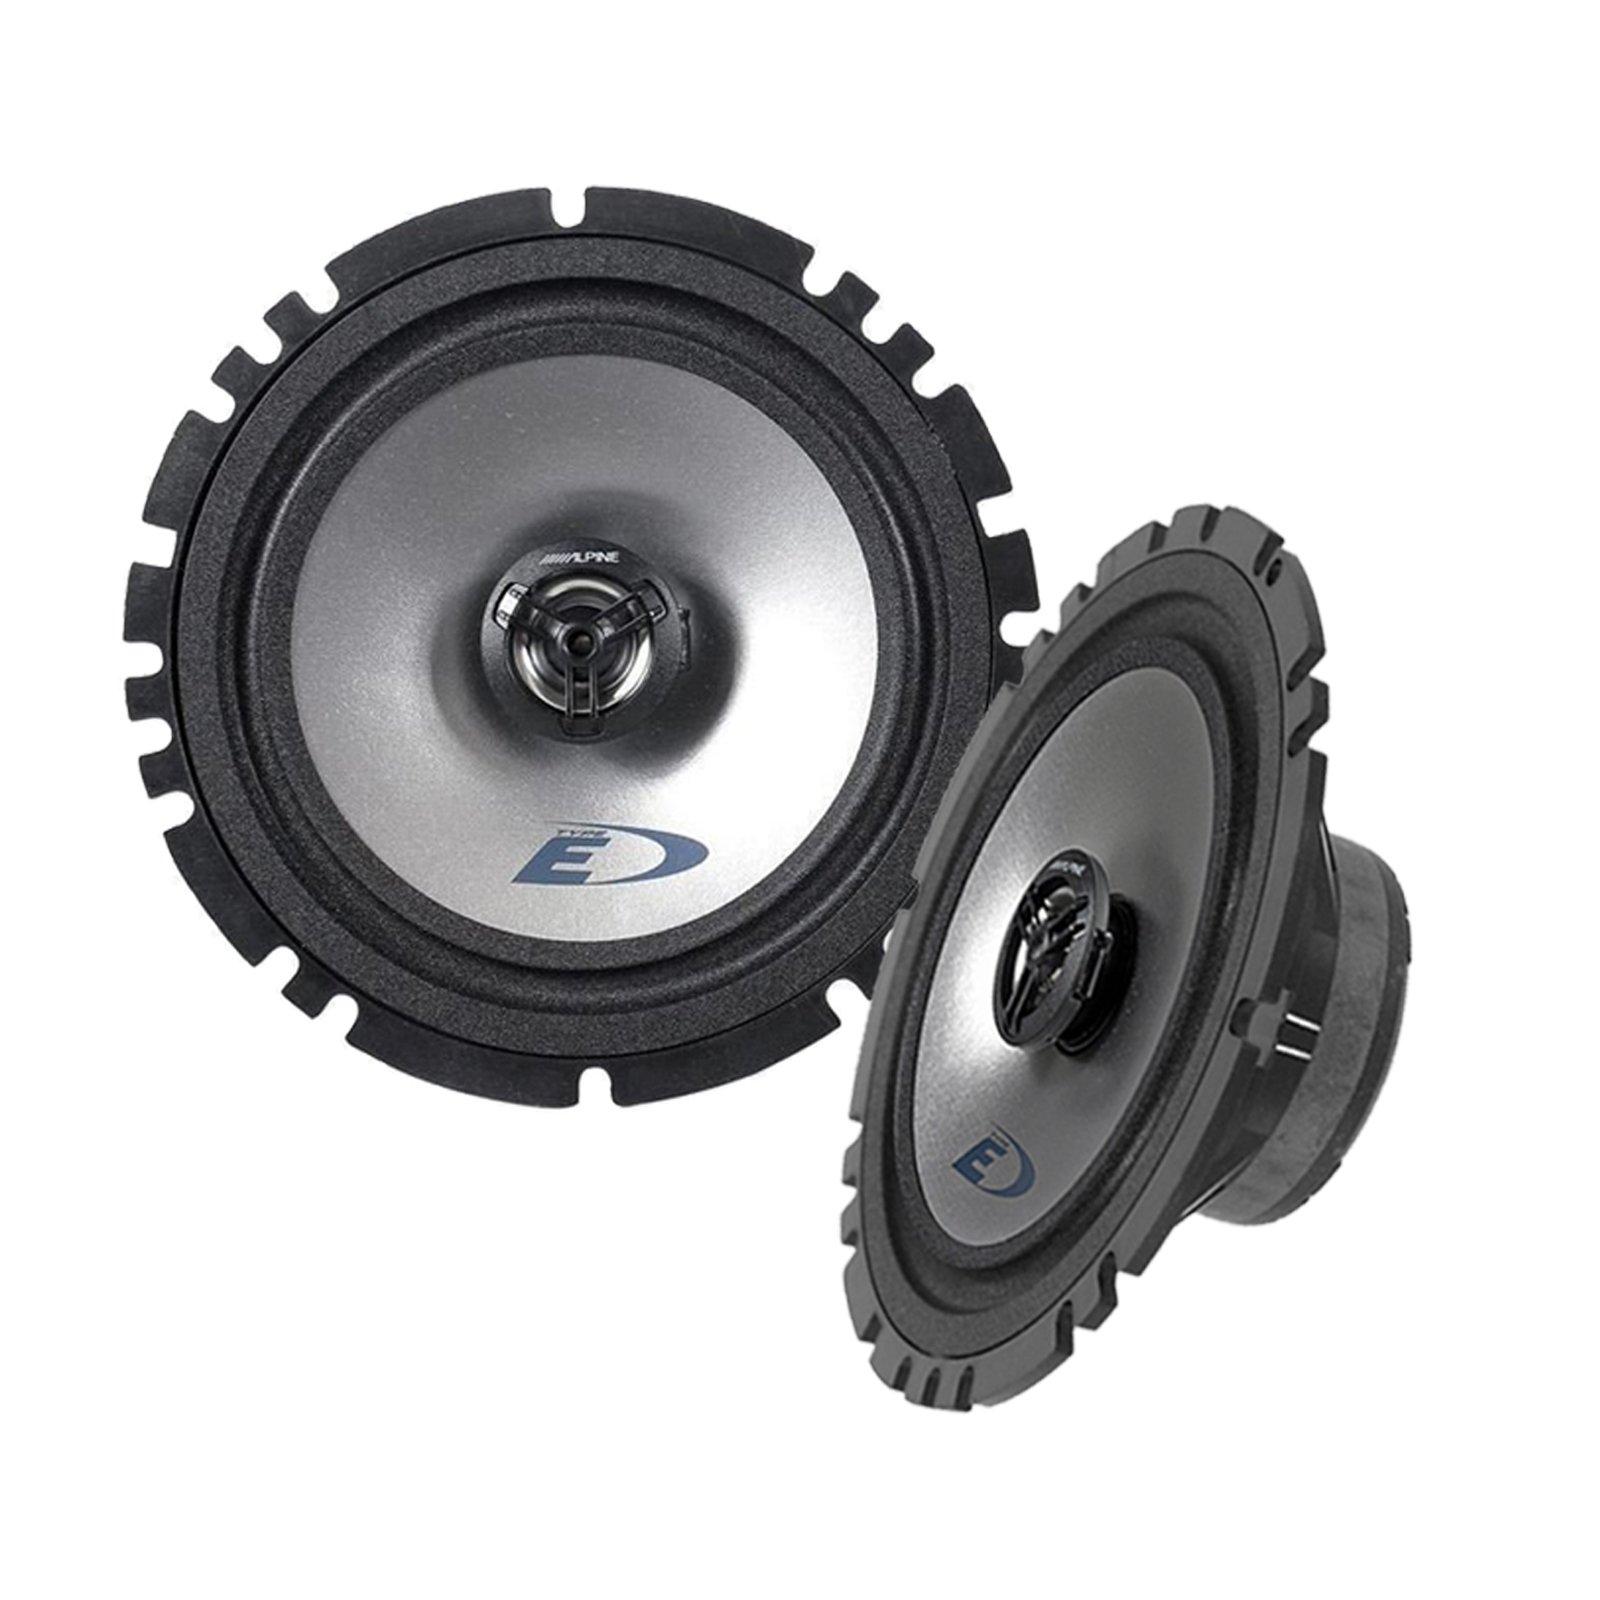 Kenwood KDC118 Car Radio AUX CD Player Receiver - Bundle Combo With 2x Alpine 6.5'' 80W 2-Way Coaxial Car Speakers + 2x 6x9 Inch 280W Black Speaker + Enrock 50 Ft 18G Speaker Wire by EnrockAudioBundle (Image #2)